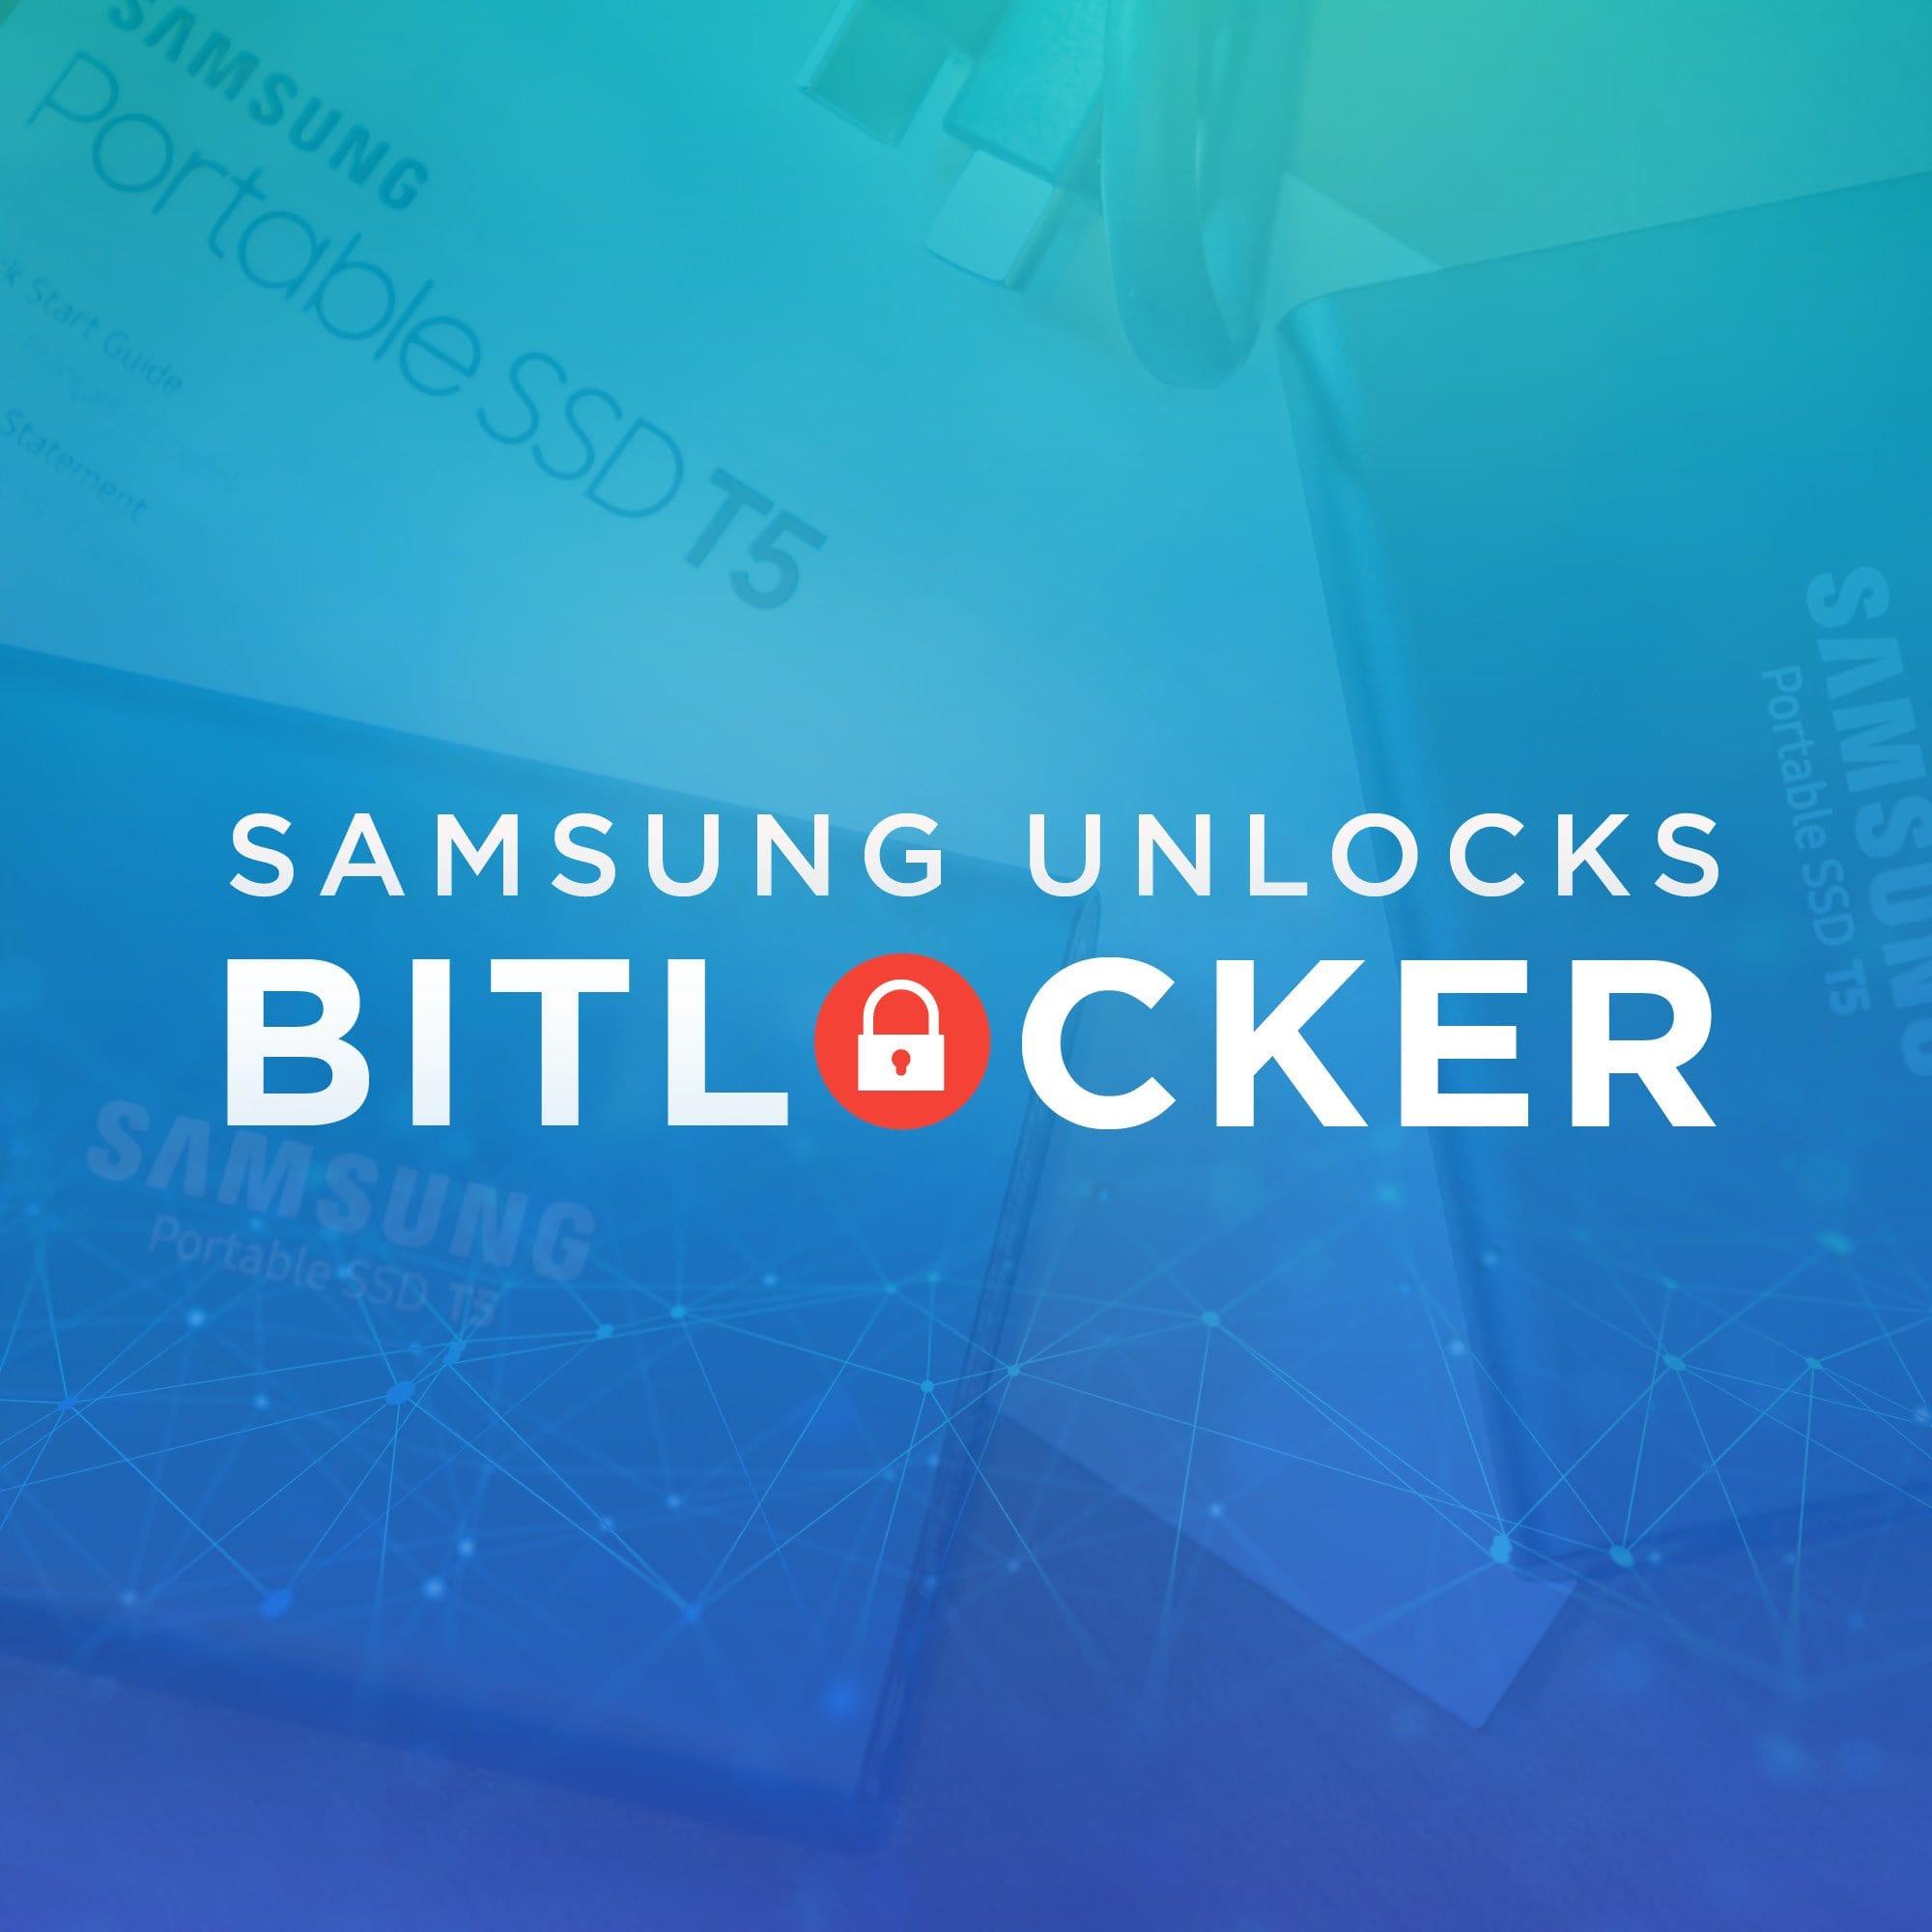 Samsung SSD Vulnerability Bypasses Bitlocker Encryption – Cloud